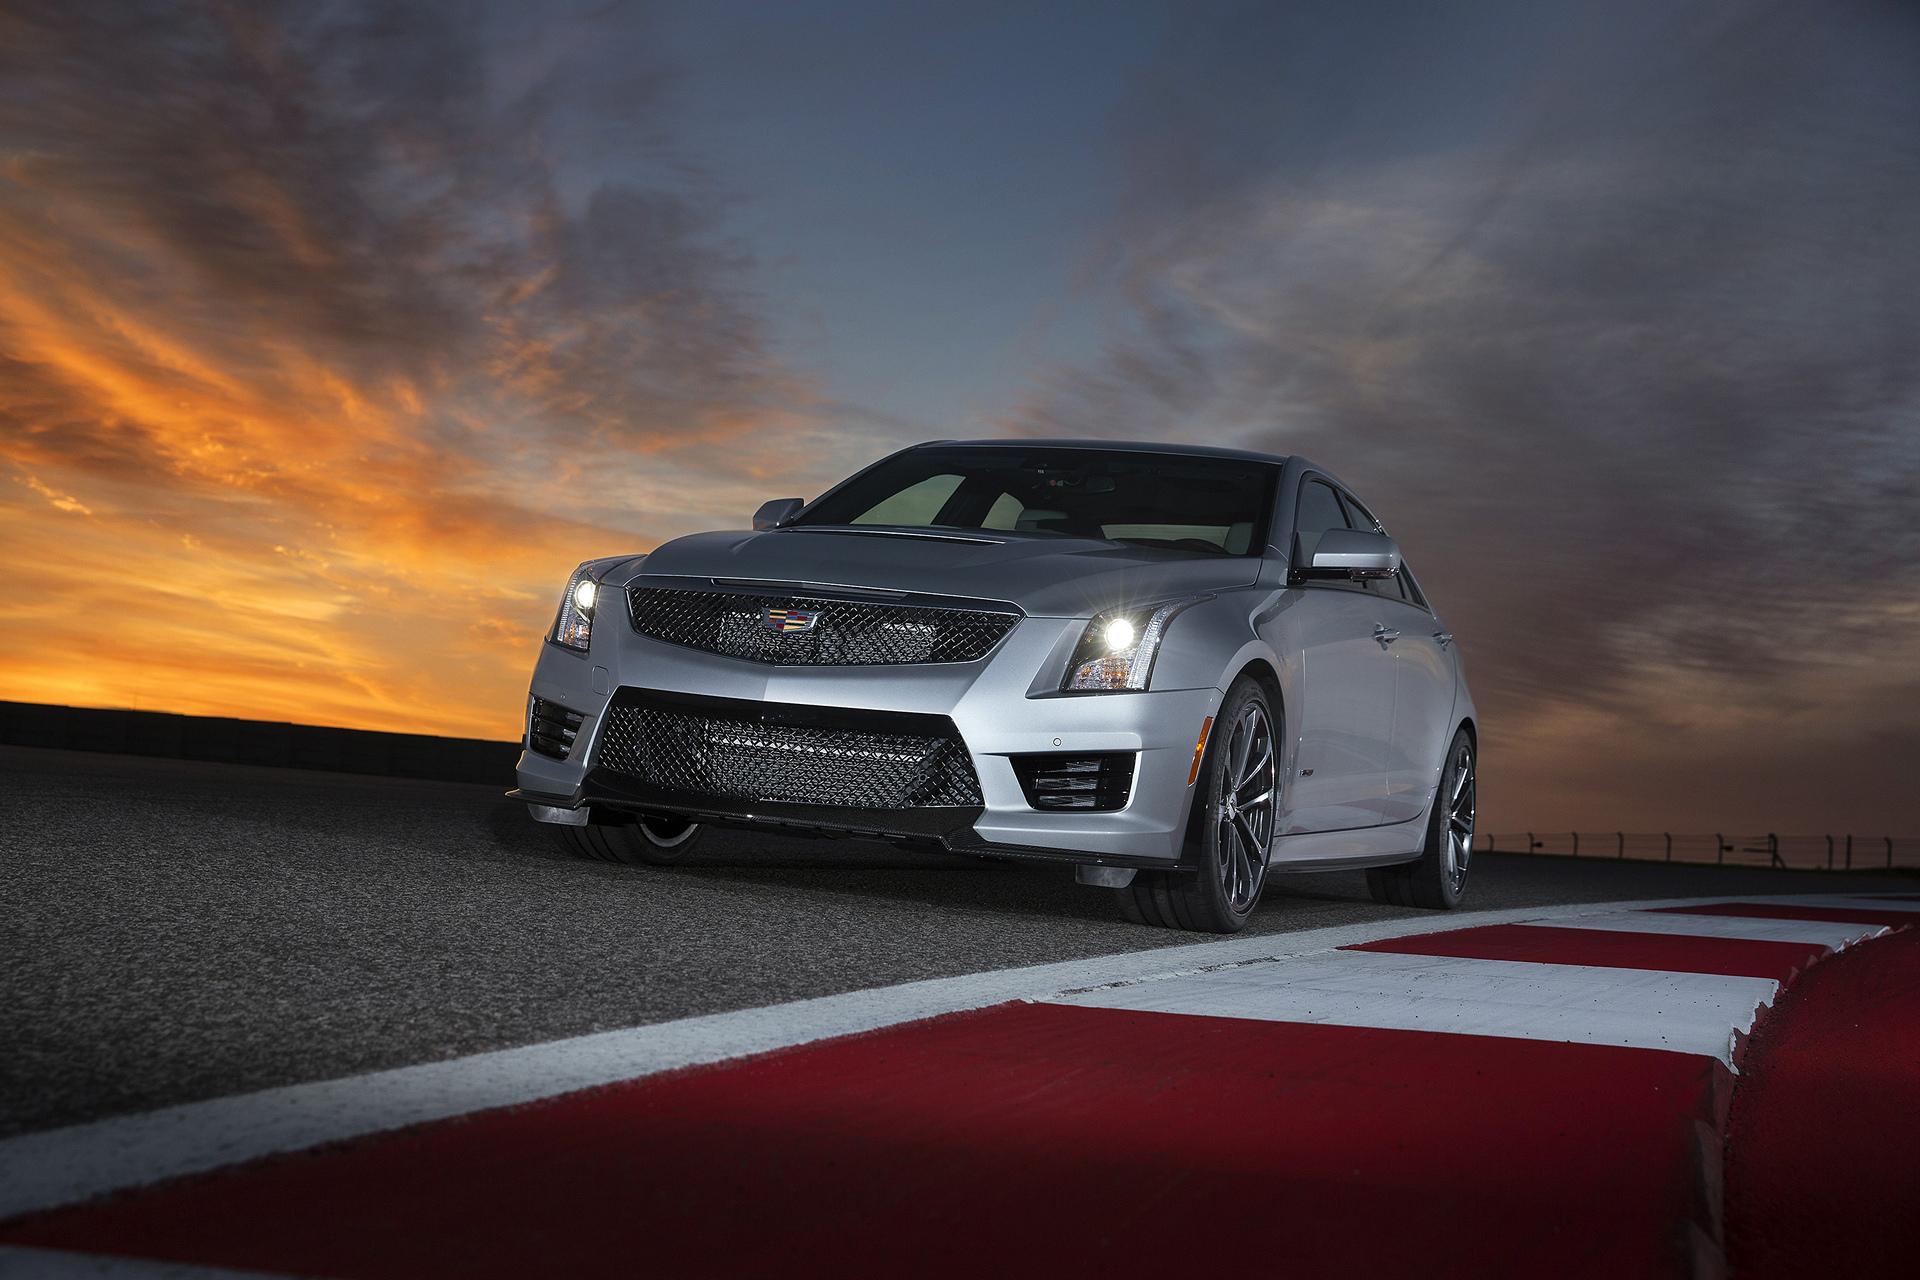 2016 Cadillac ATS-V Sedan © General Motors